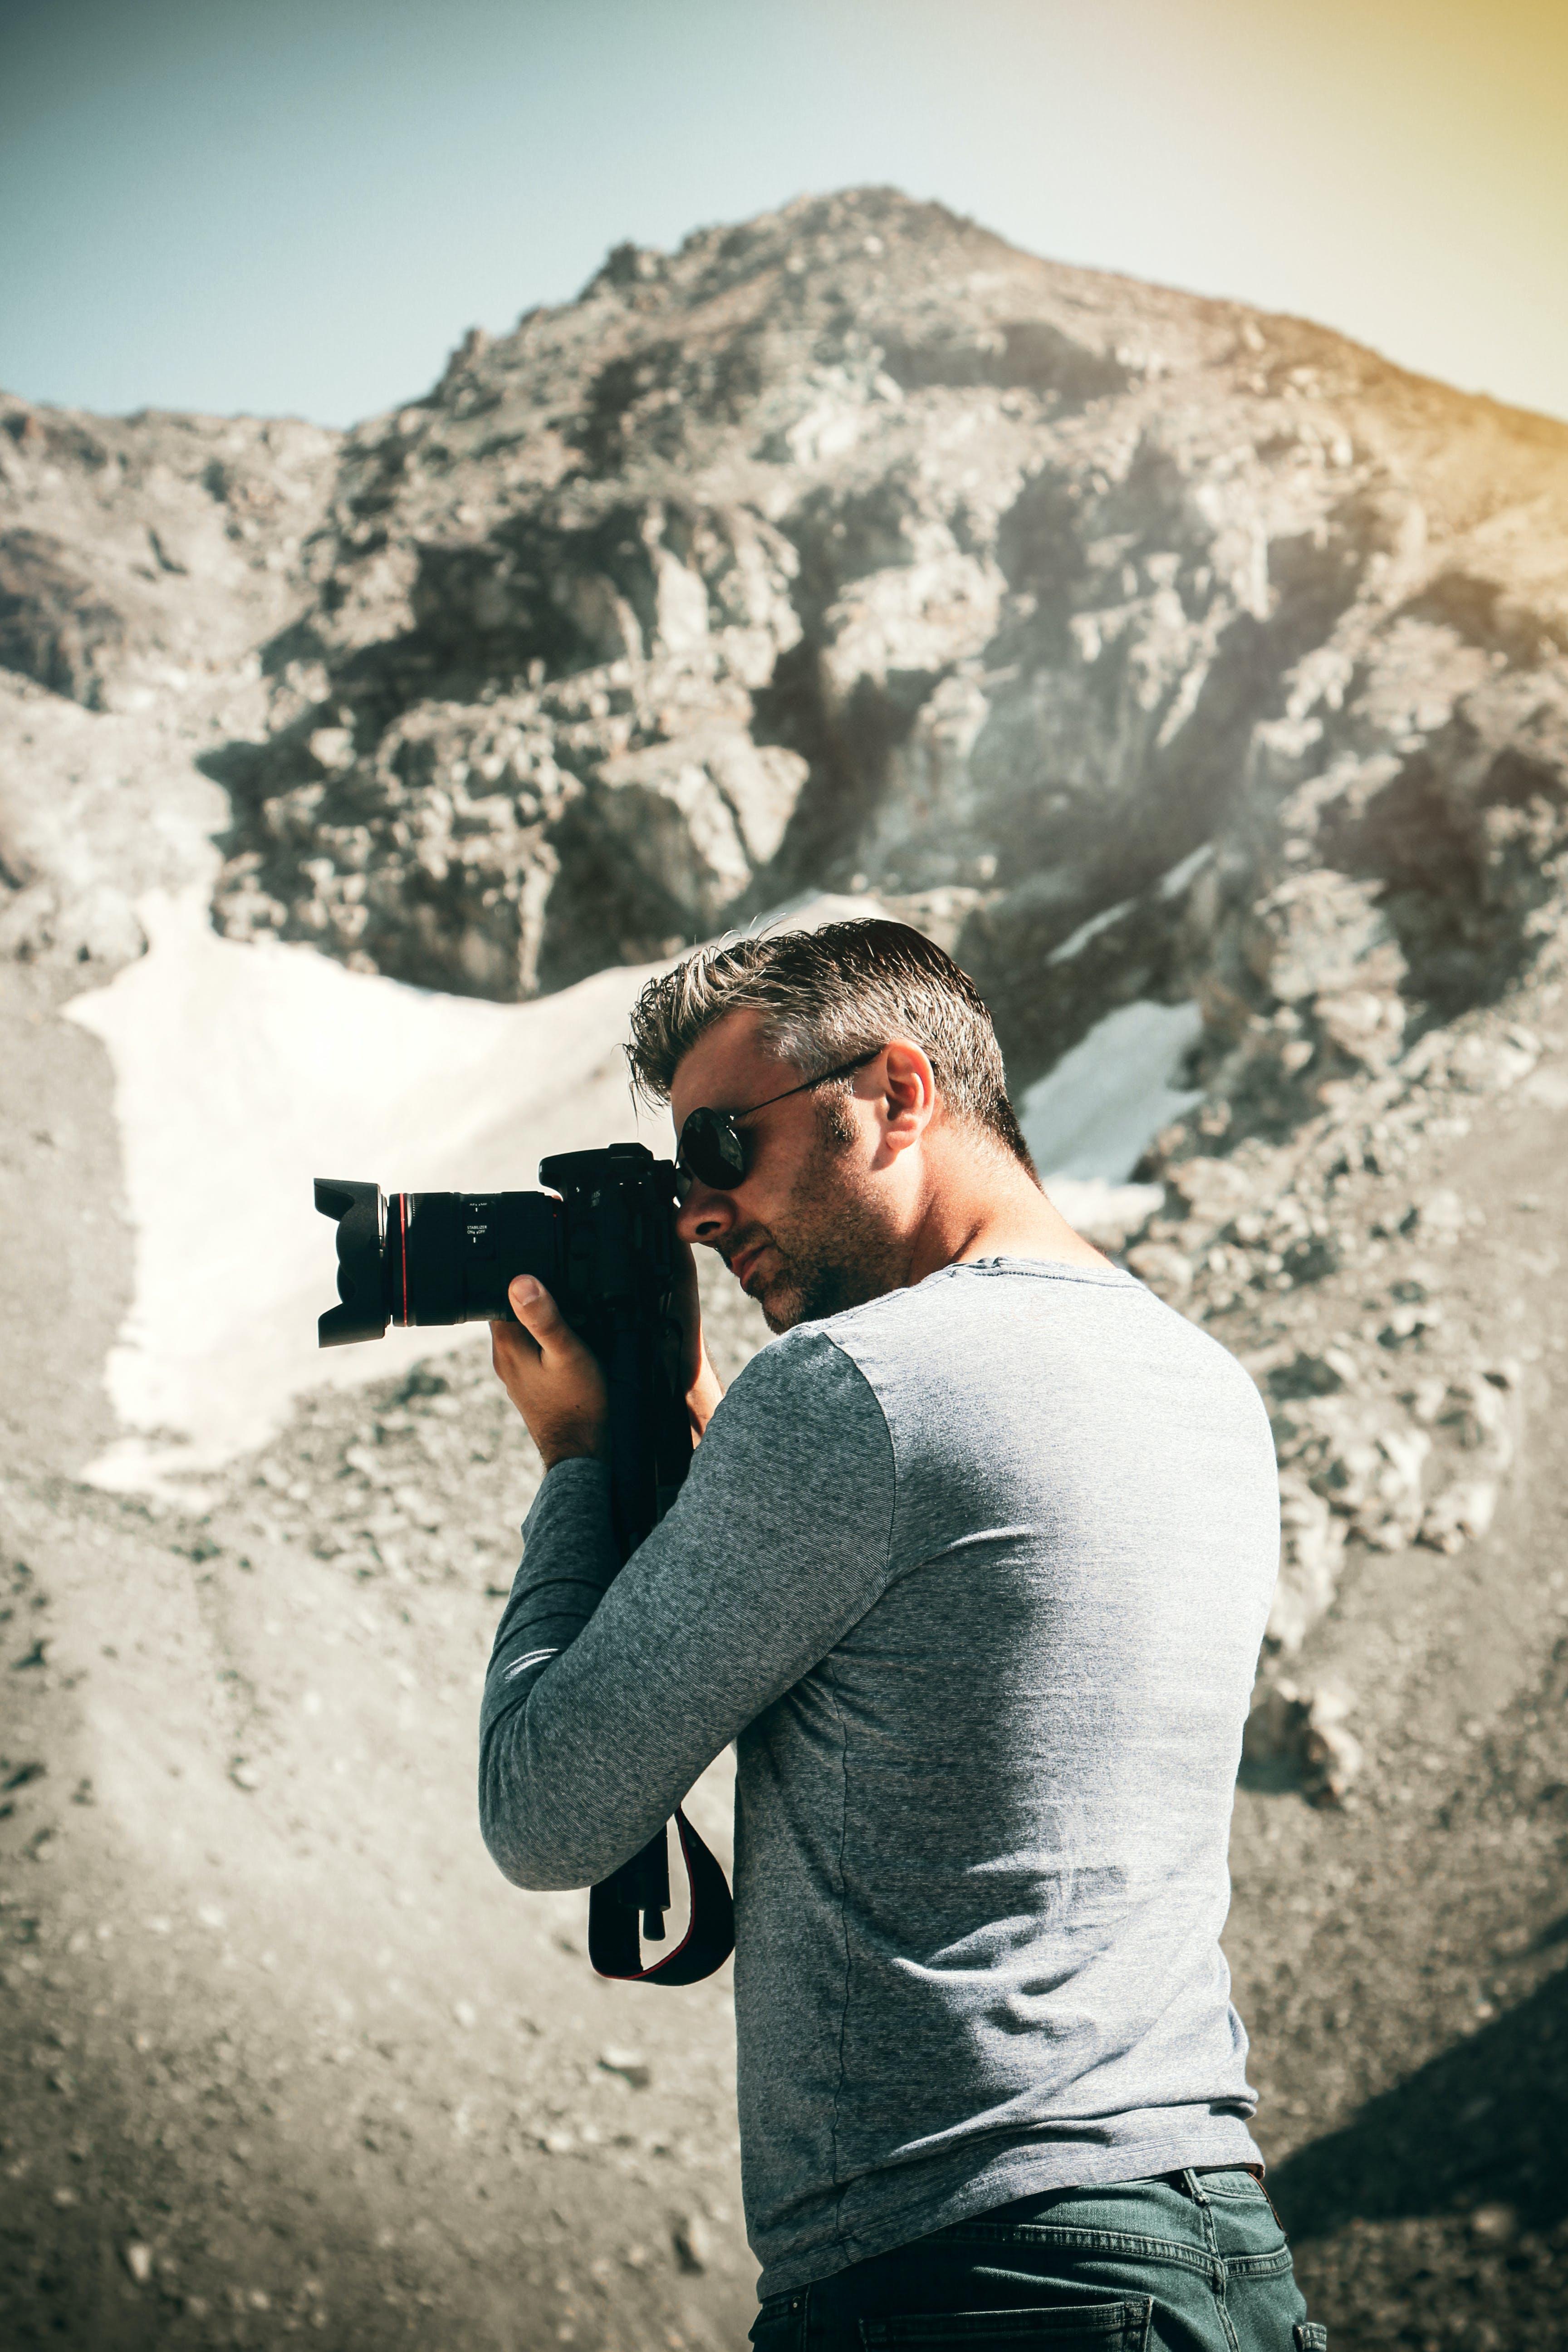 Man Standing Taking Photo Near Mountain